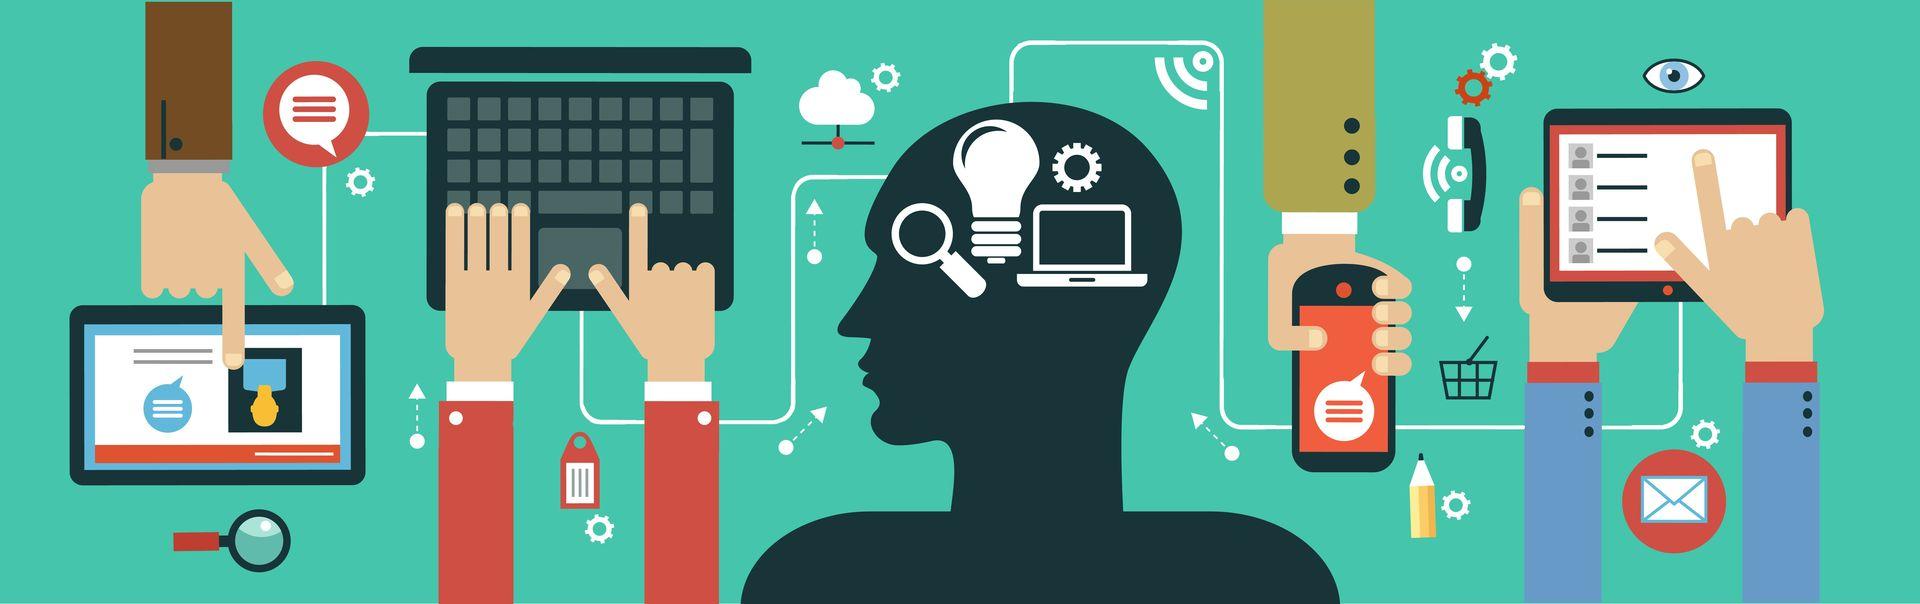 digital-marketing-intel-digital-marketing